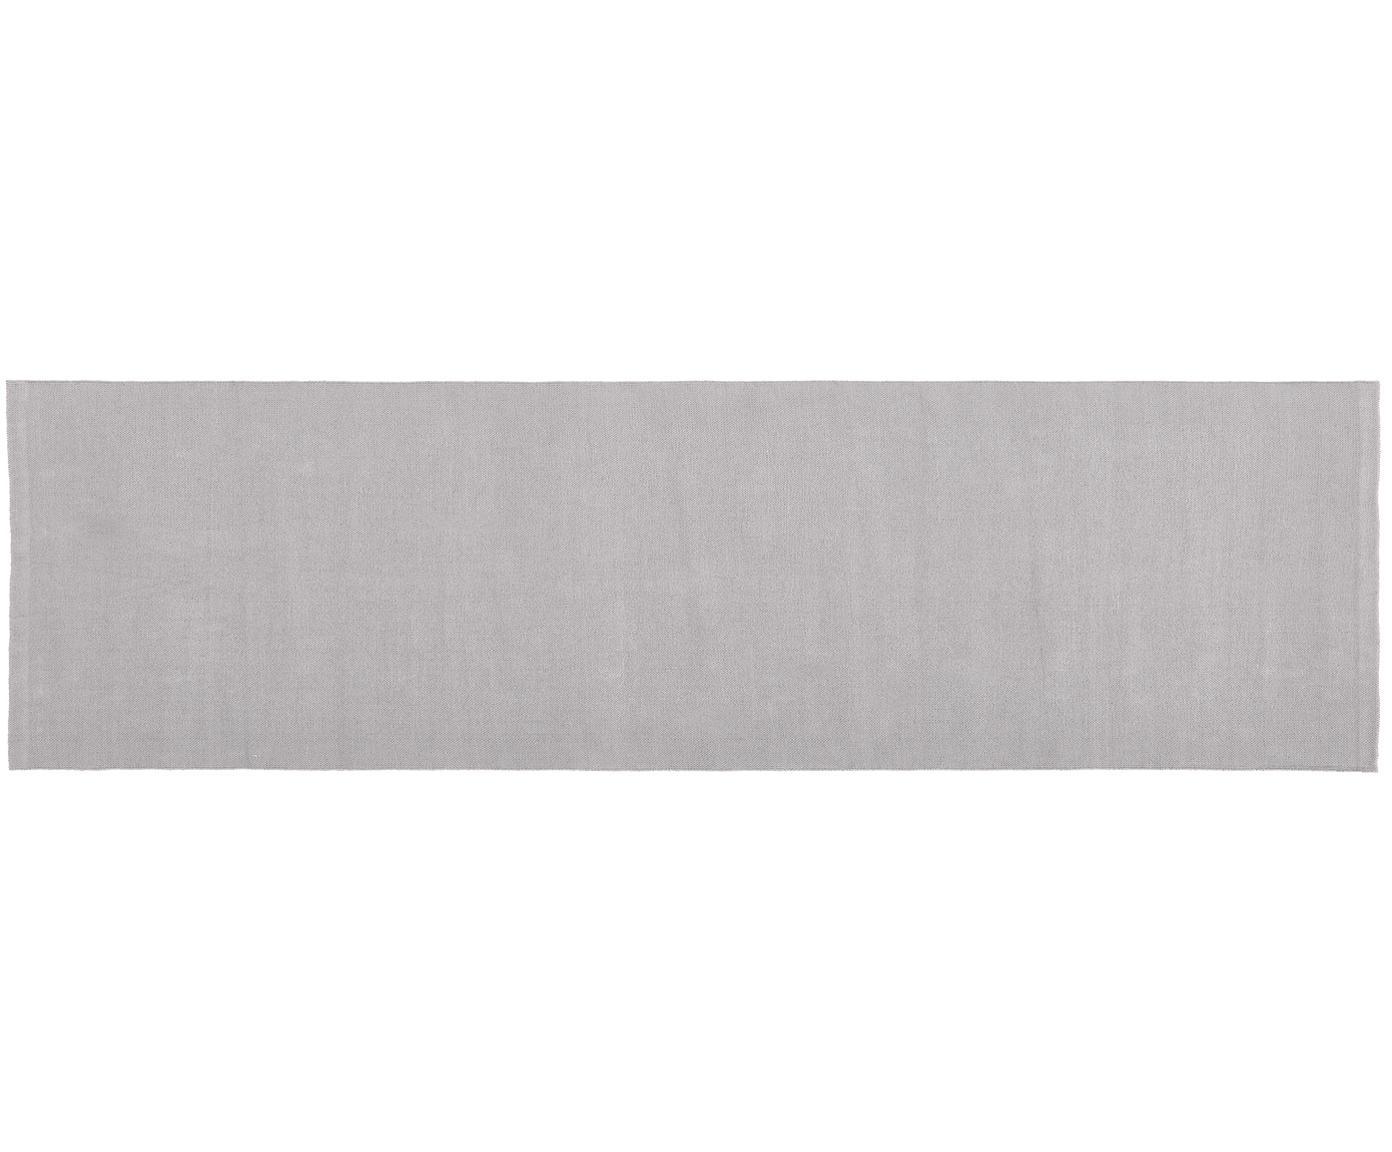 Alfombra artesanal de algodón Agneta, Algodón, Gris, An 70 x L 250 cm